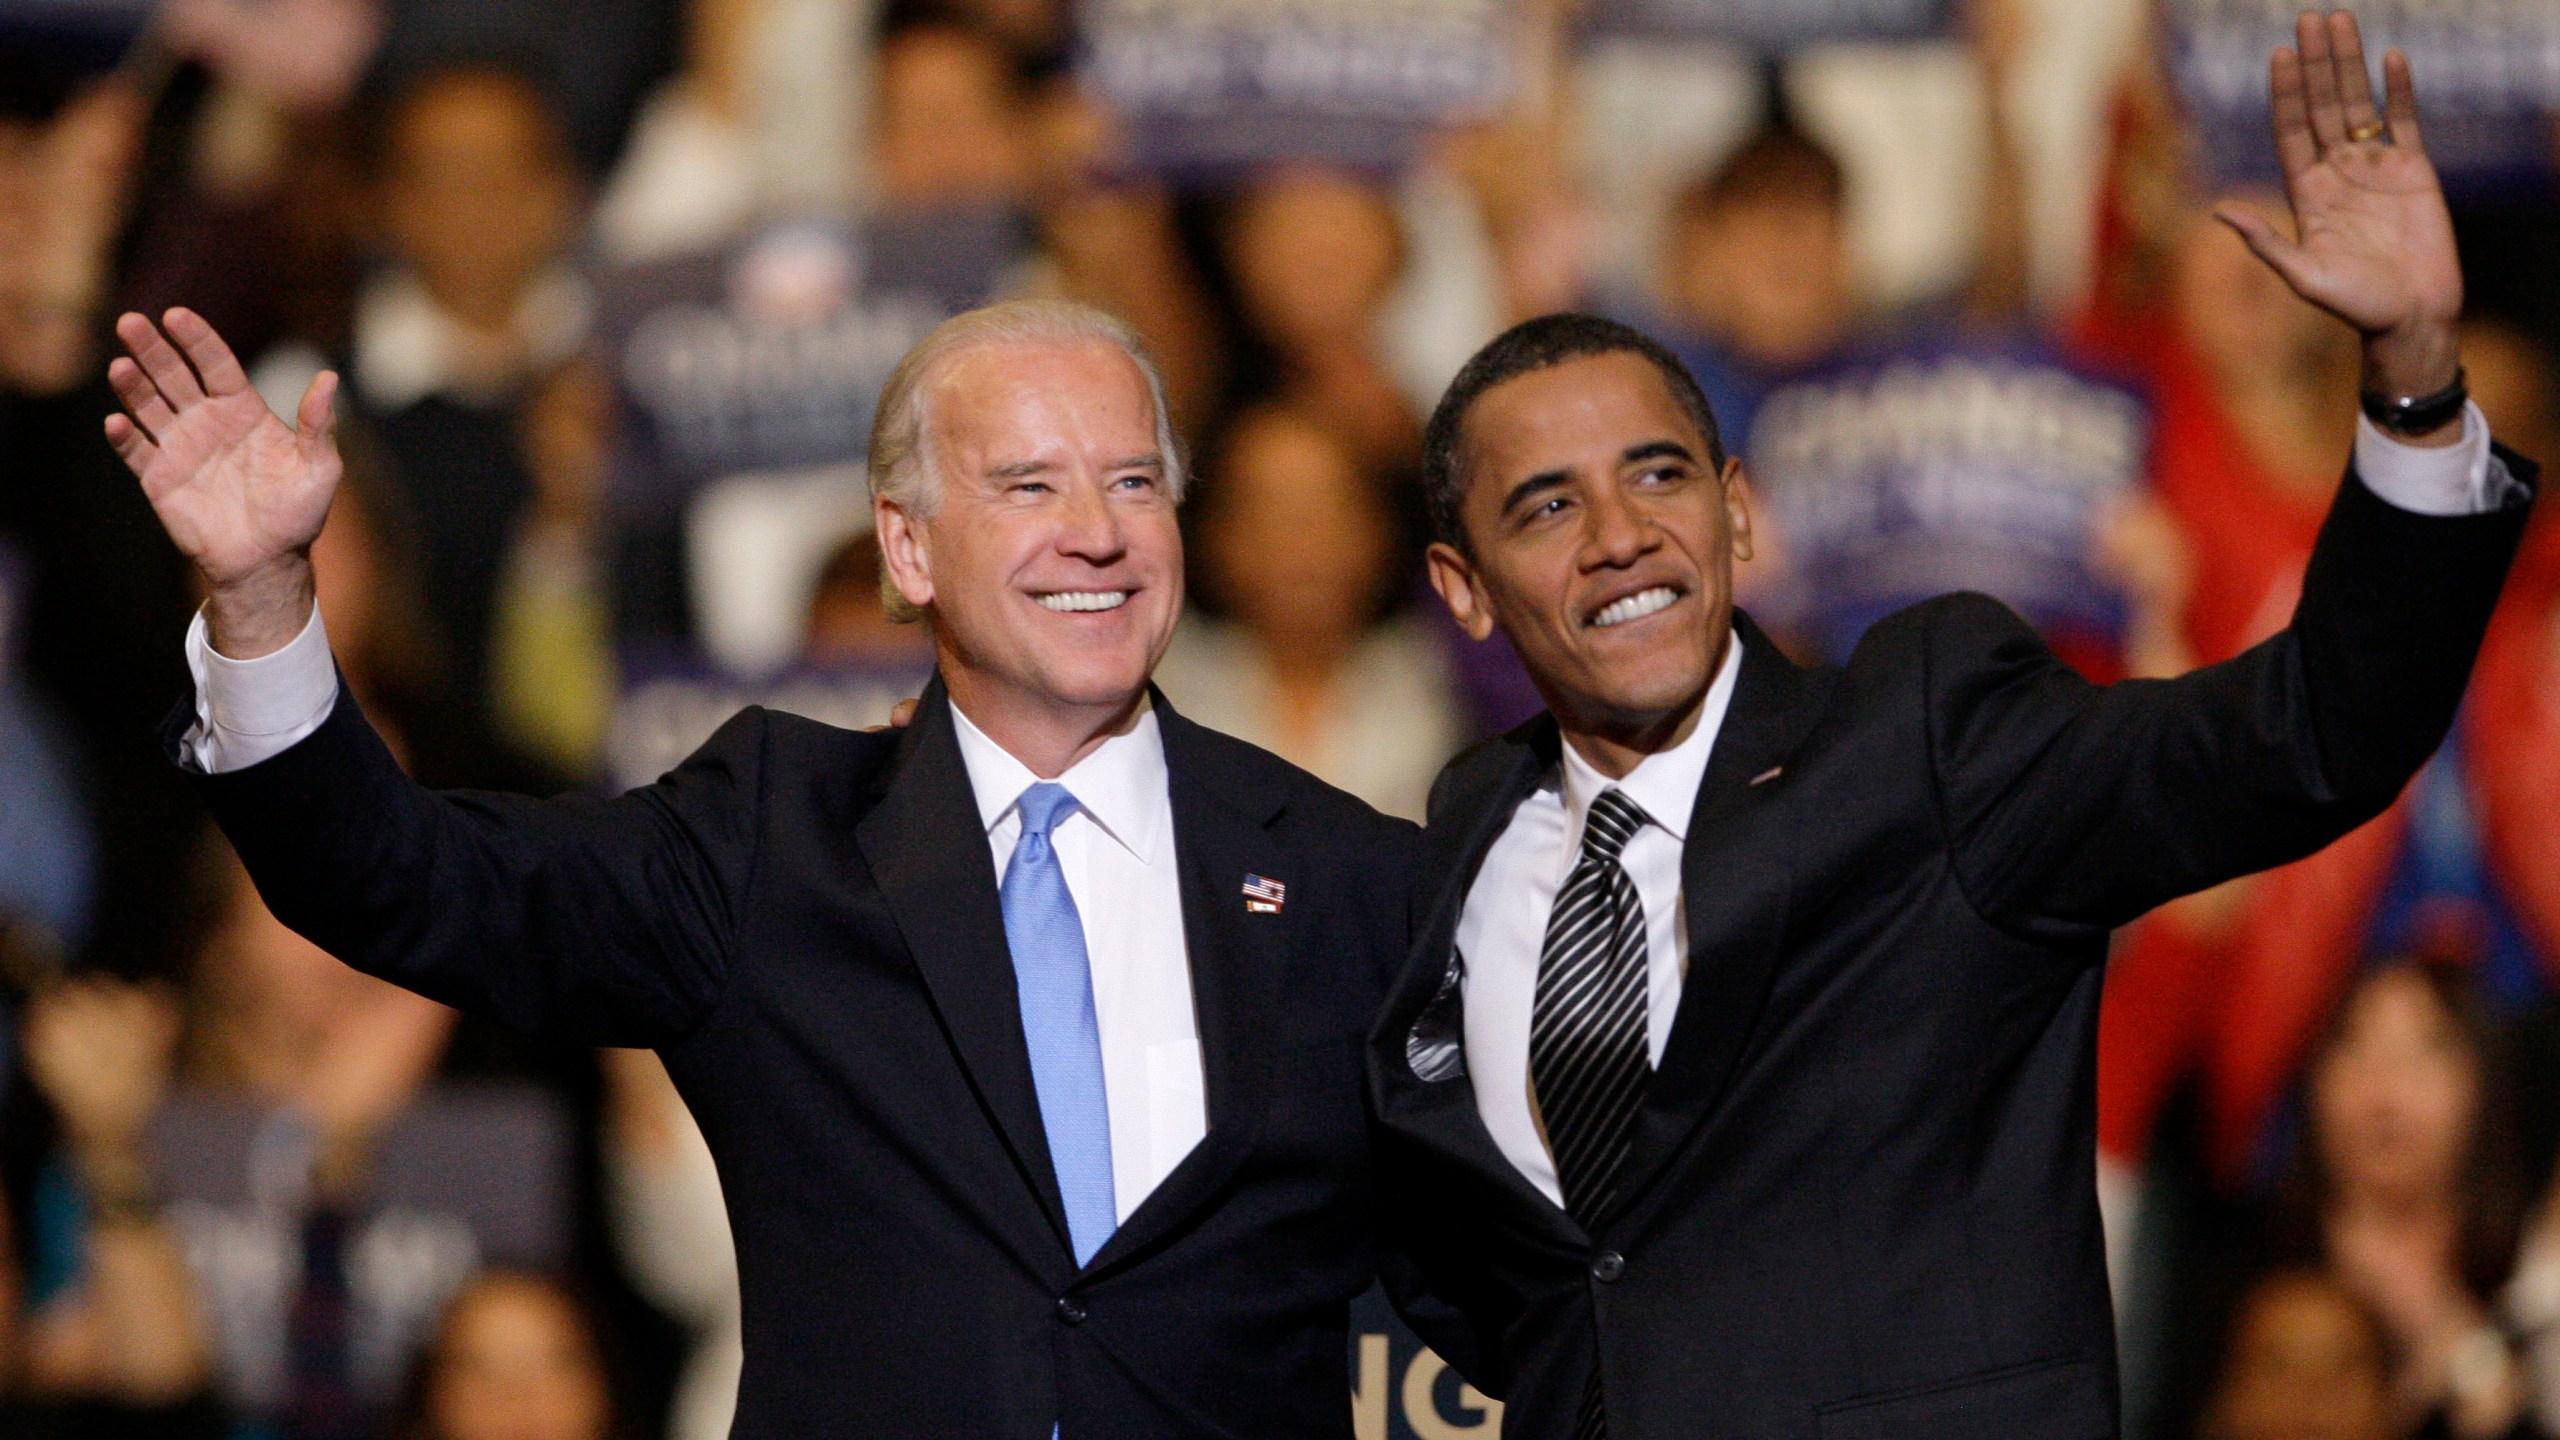 Joe Biden, Barack Obama